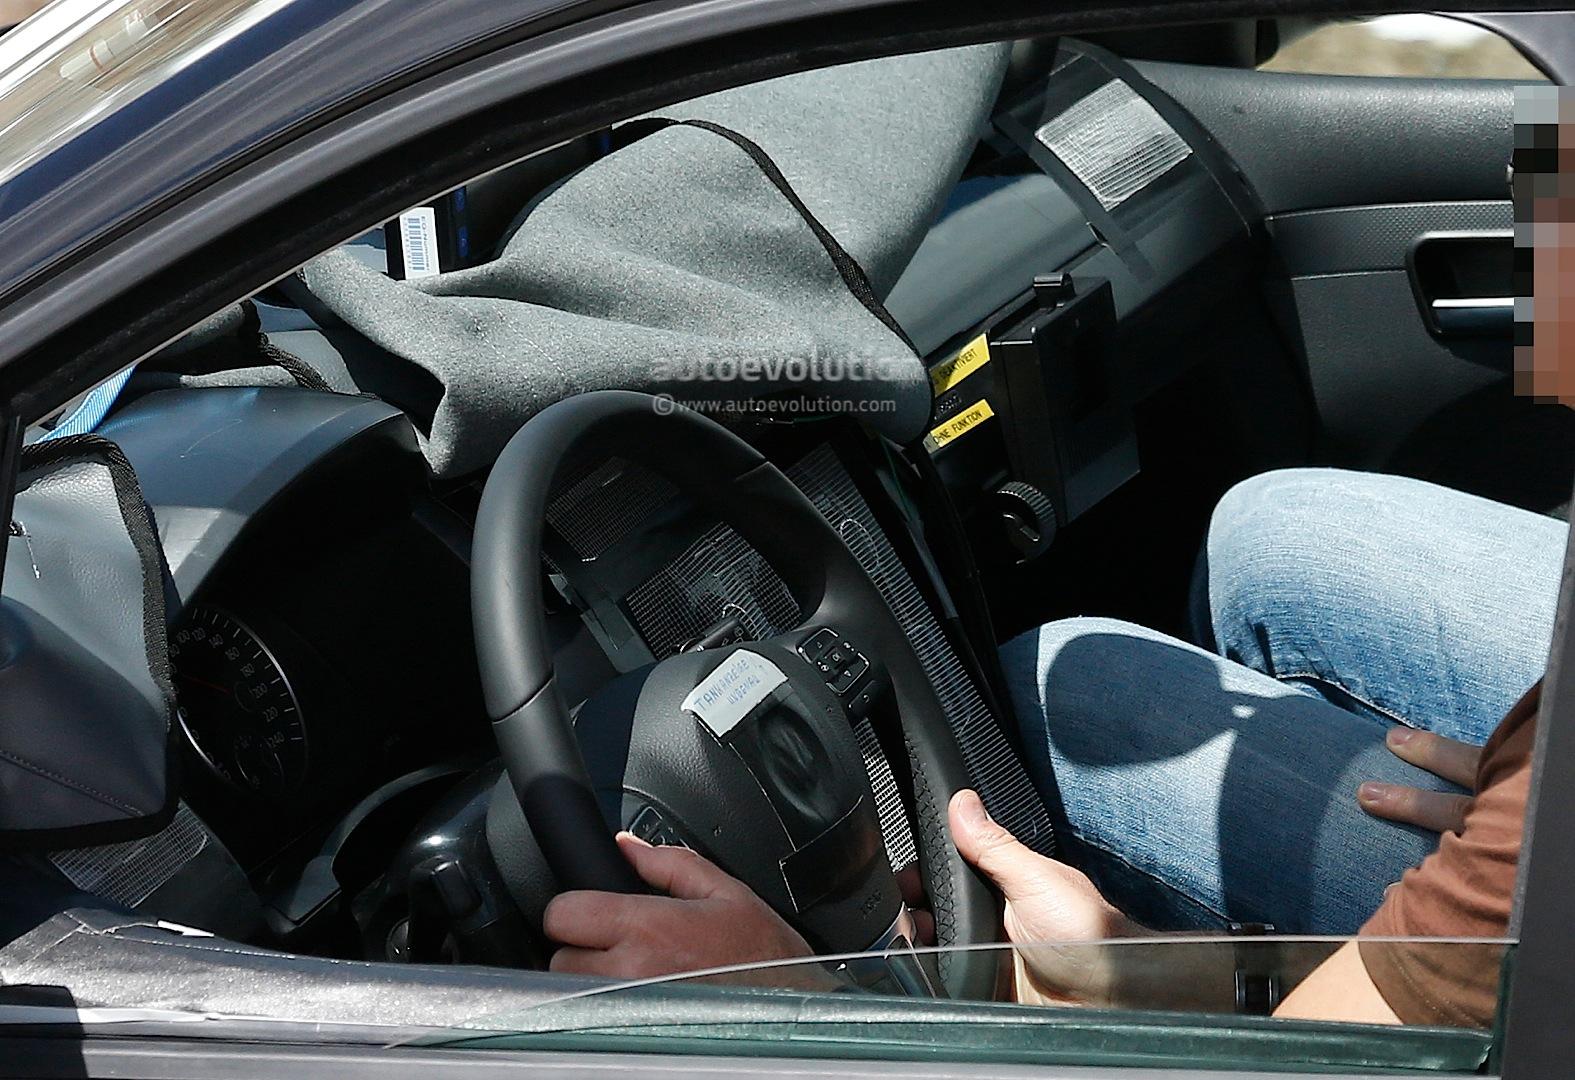 Spyshots: New Volkswagen Caddy Interior Revealed - autoevolution